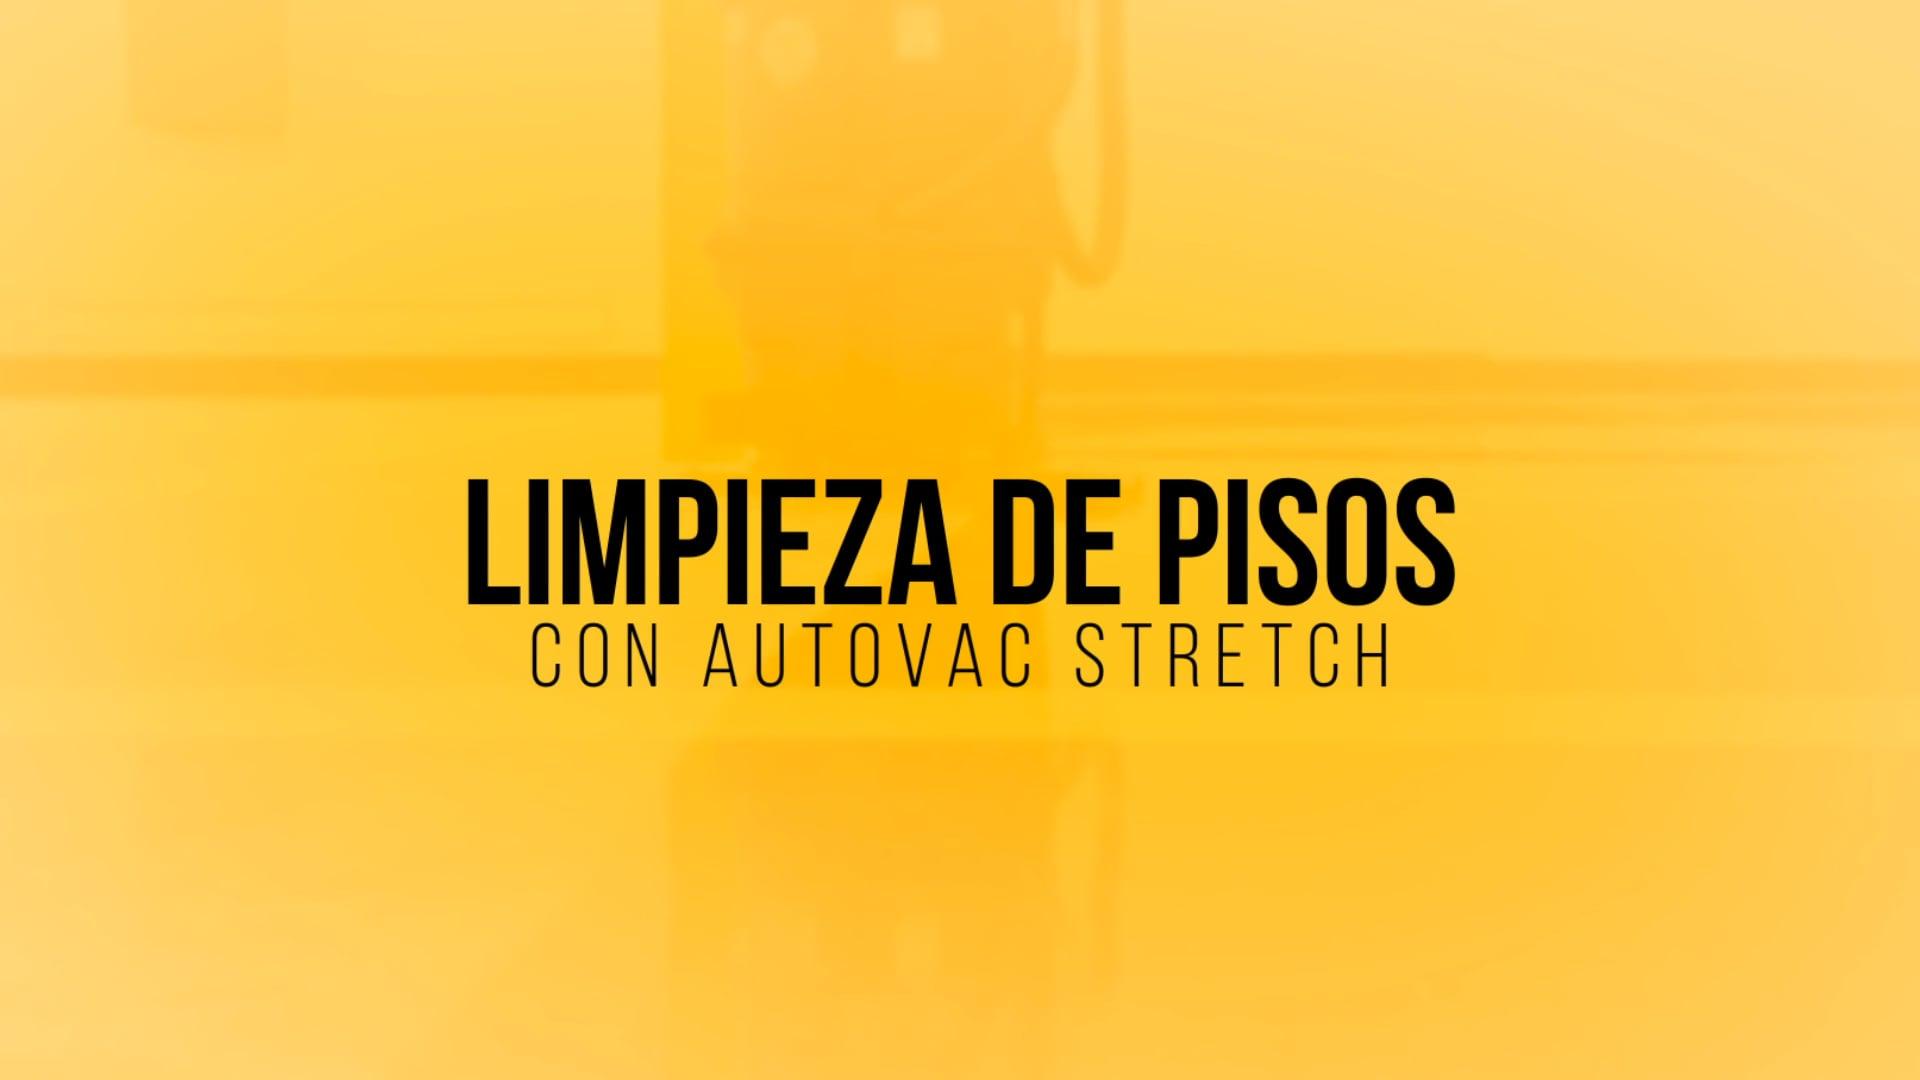 Limpieza de Pisos con AutoVac Stretch